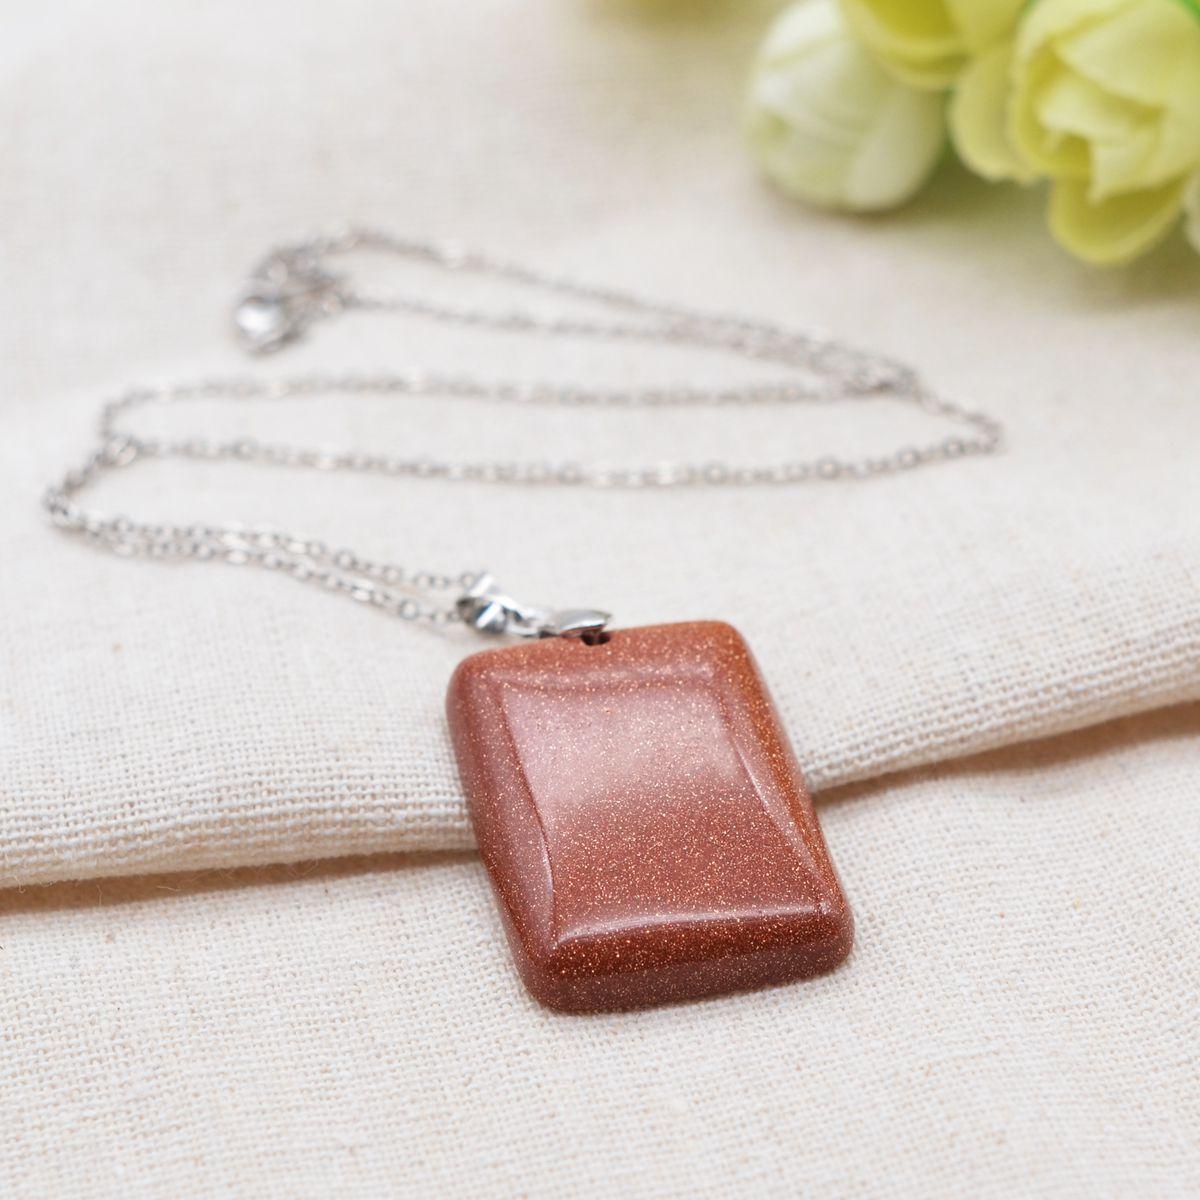 Charms Rectangular Stone Pendant Necklace for Women Men Jewellery Choker Necklaces Pendants Jewelry